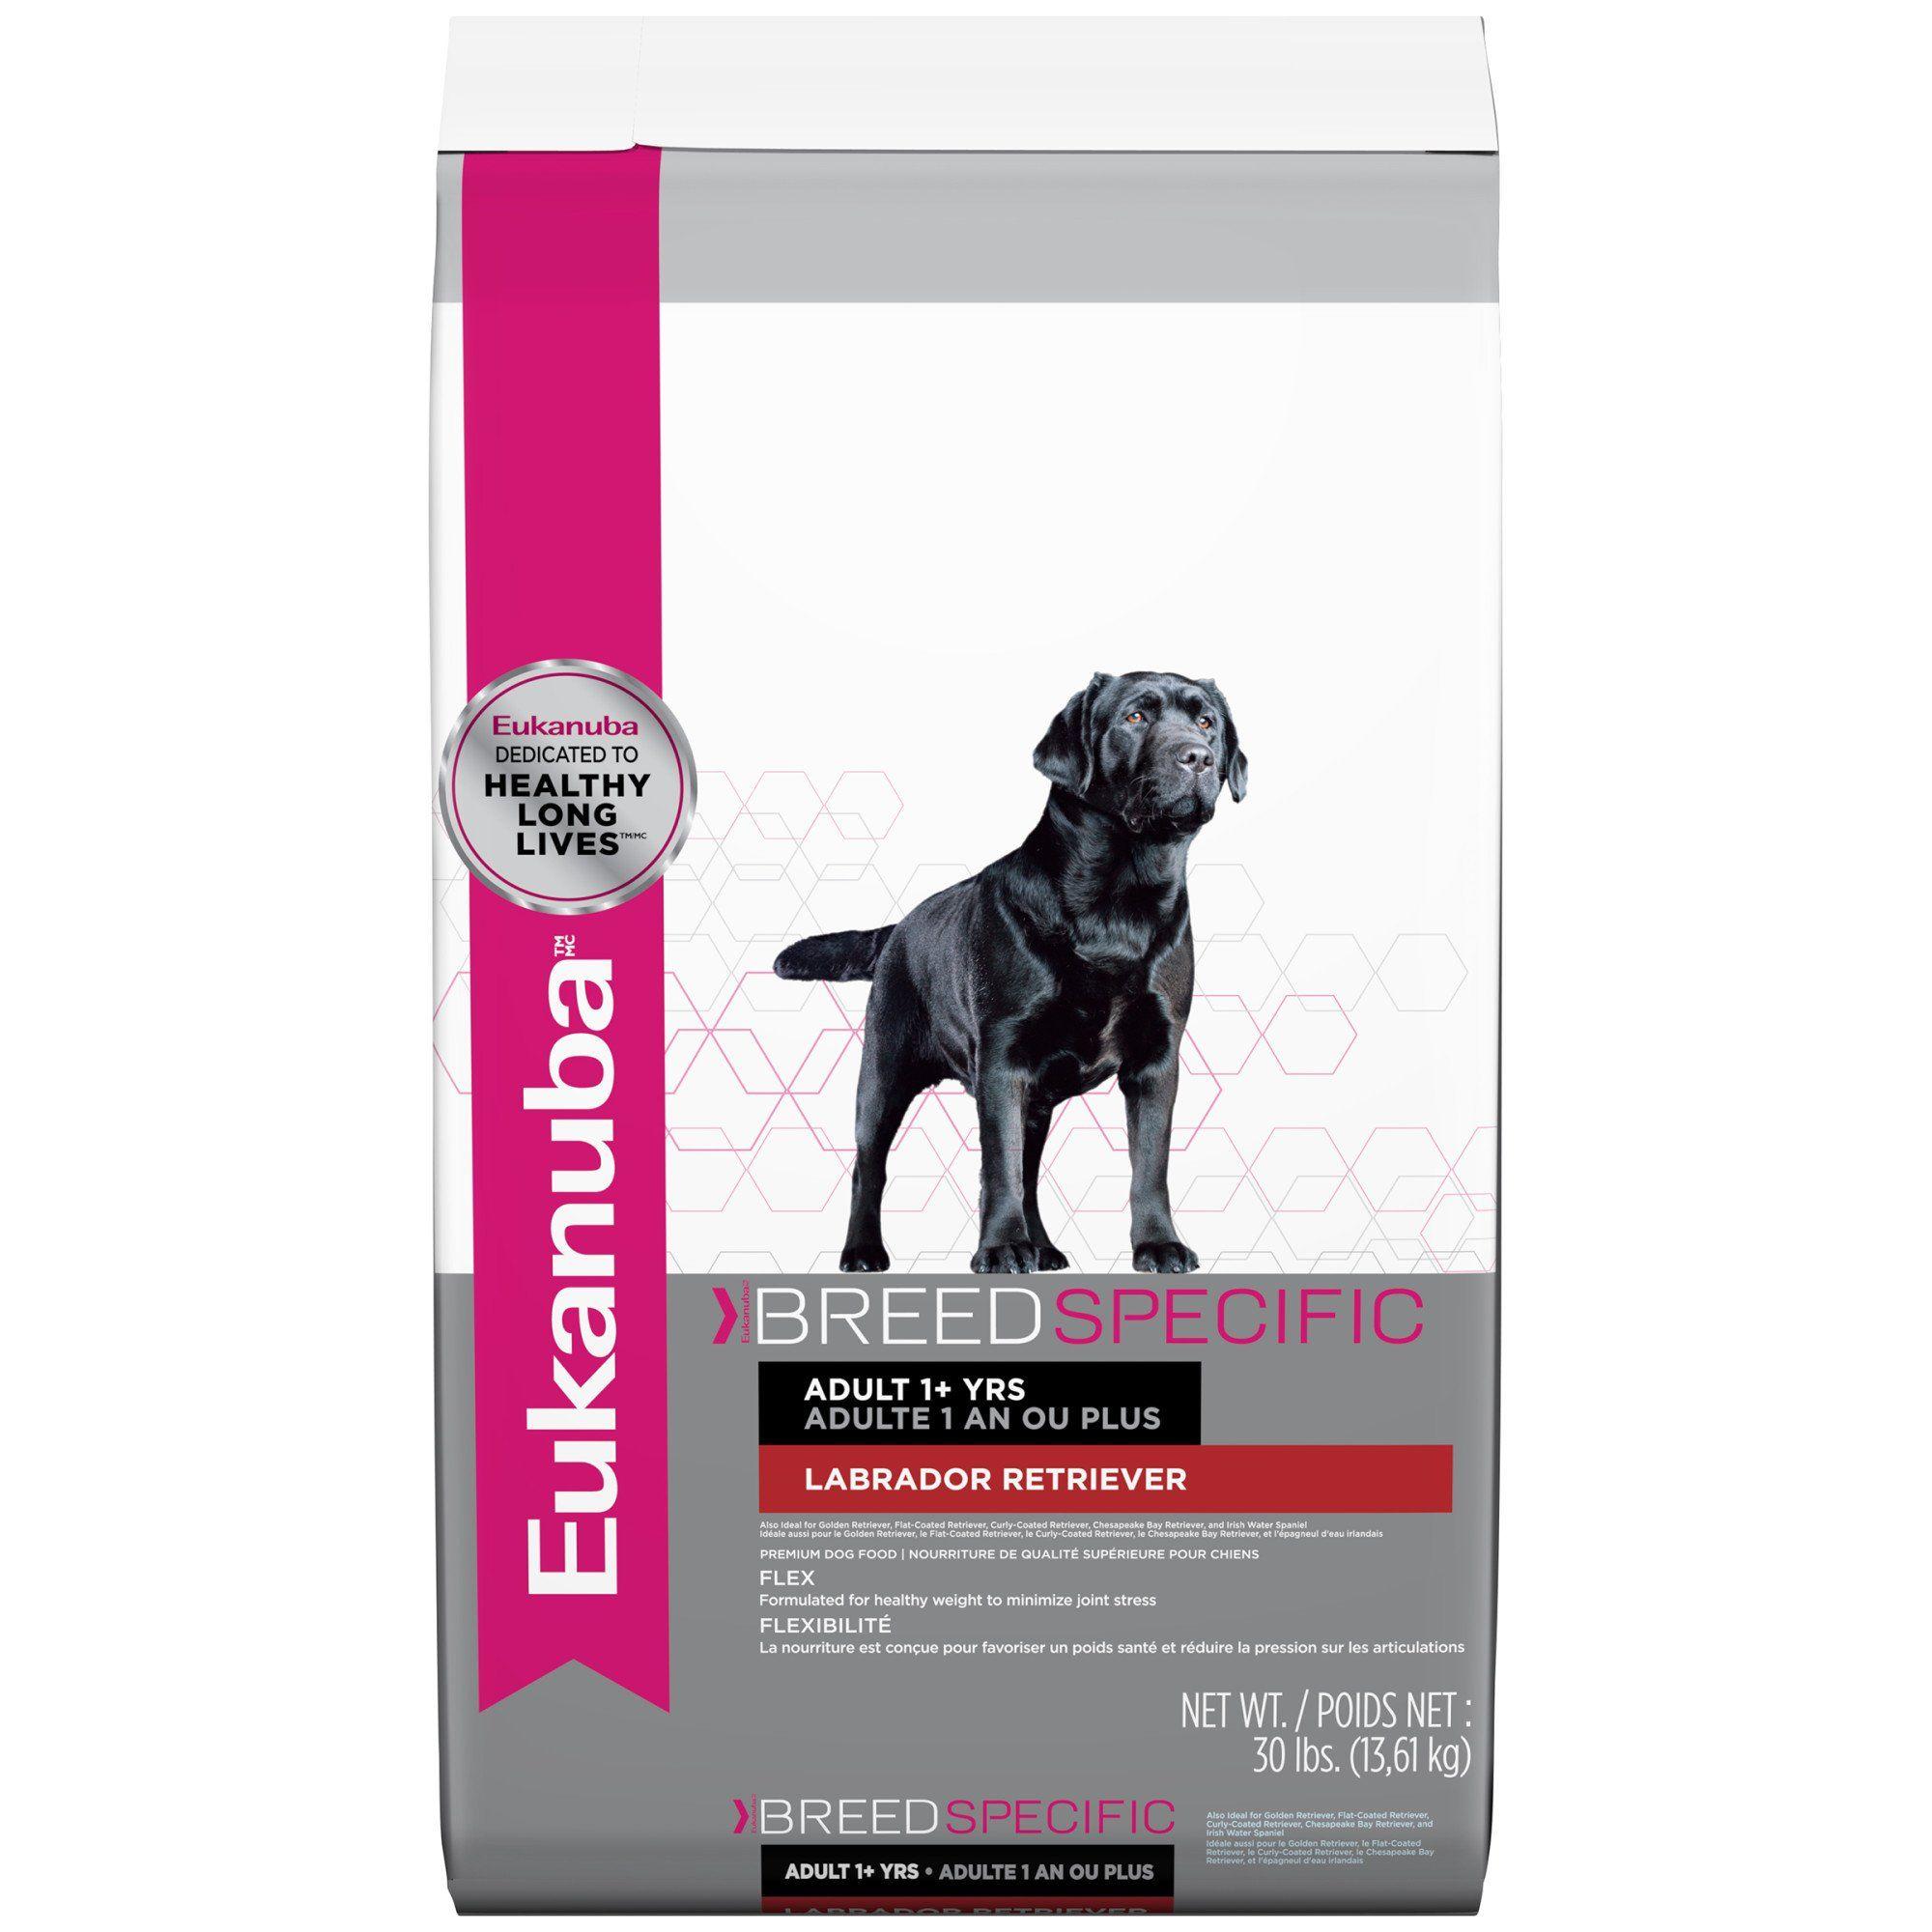 Eukanuba Breed Specific Labrador Retriever Adult Dry Dog Food 30